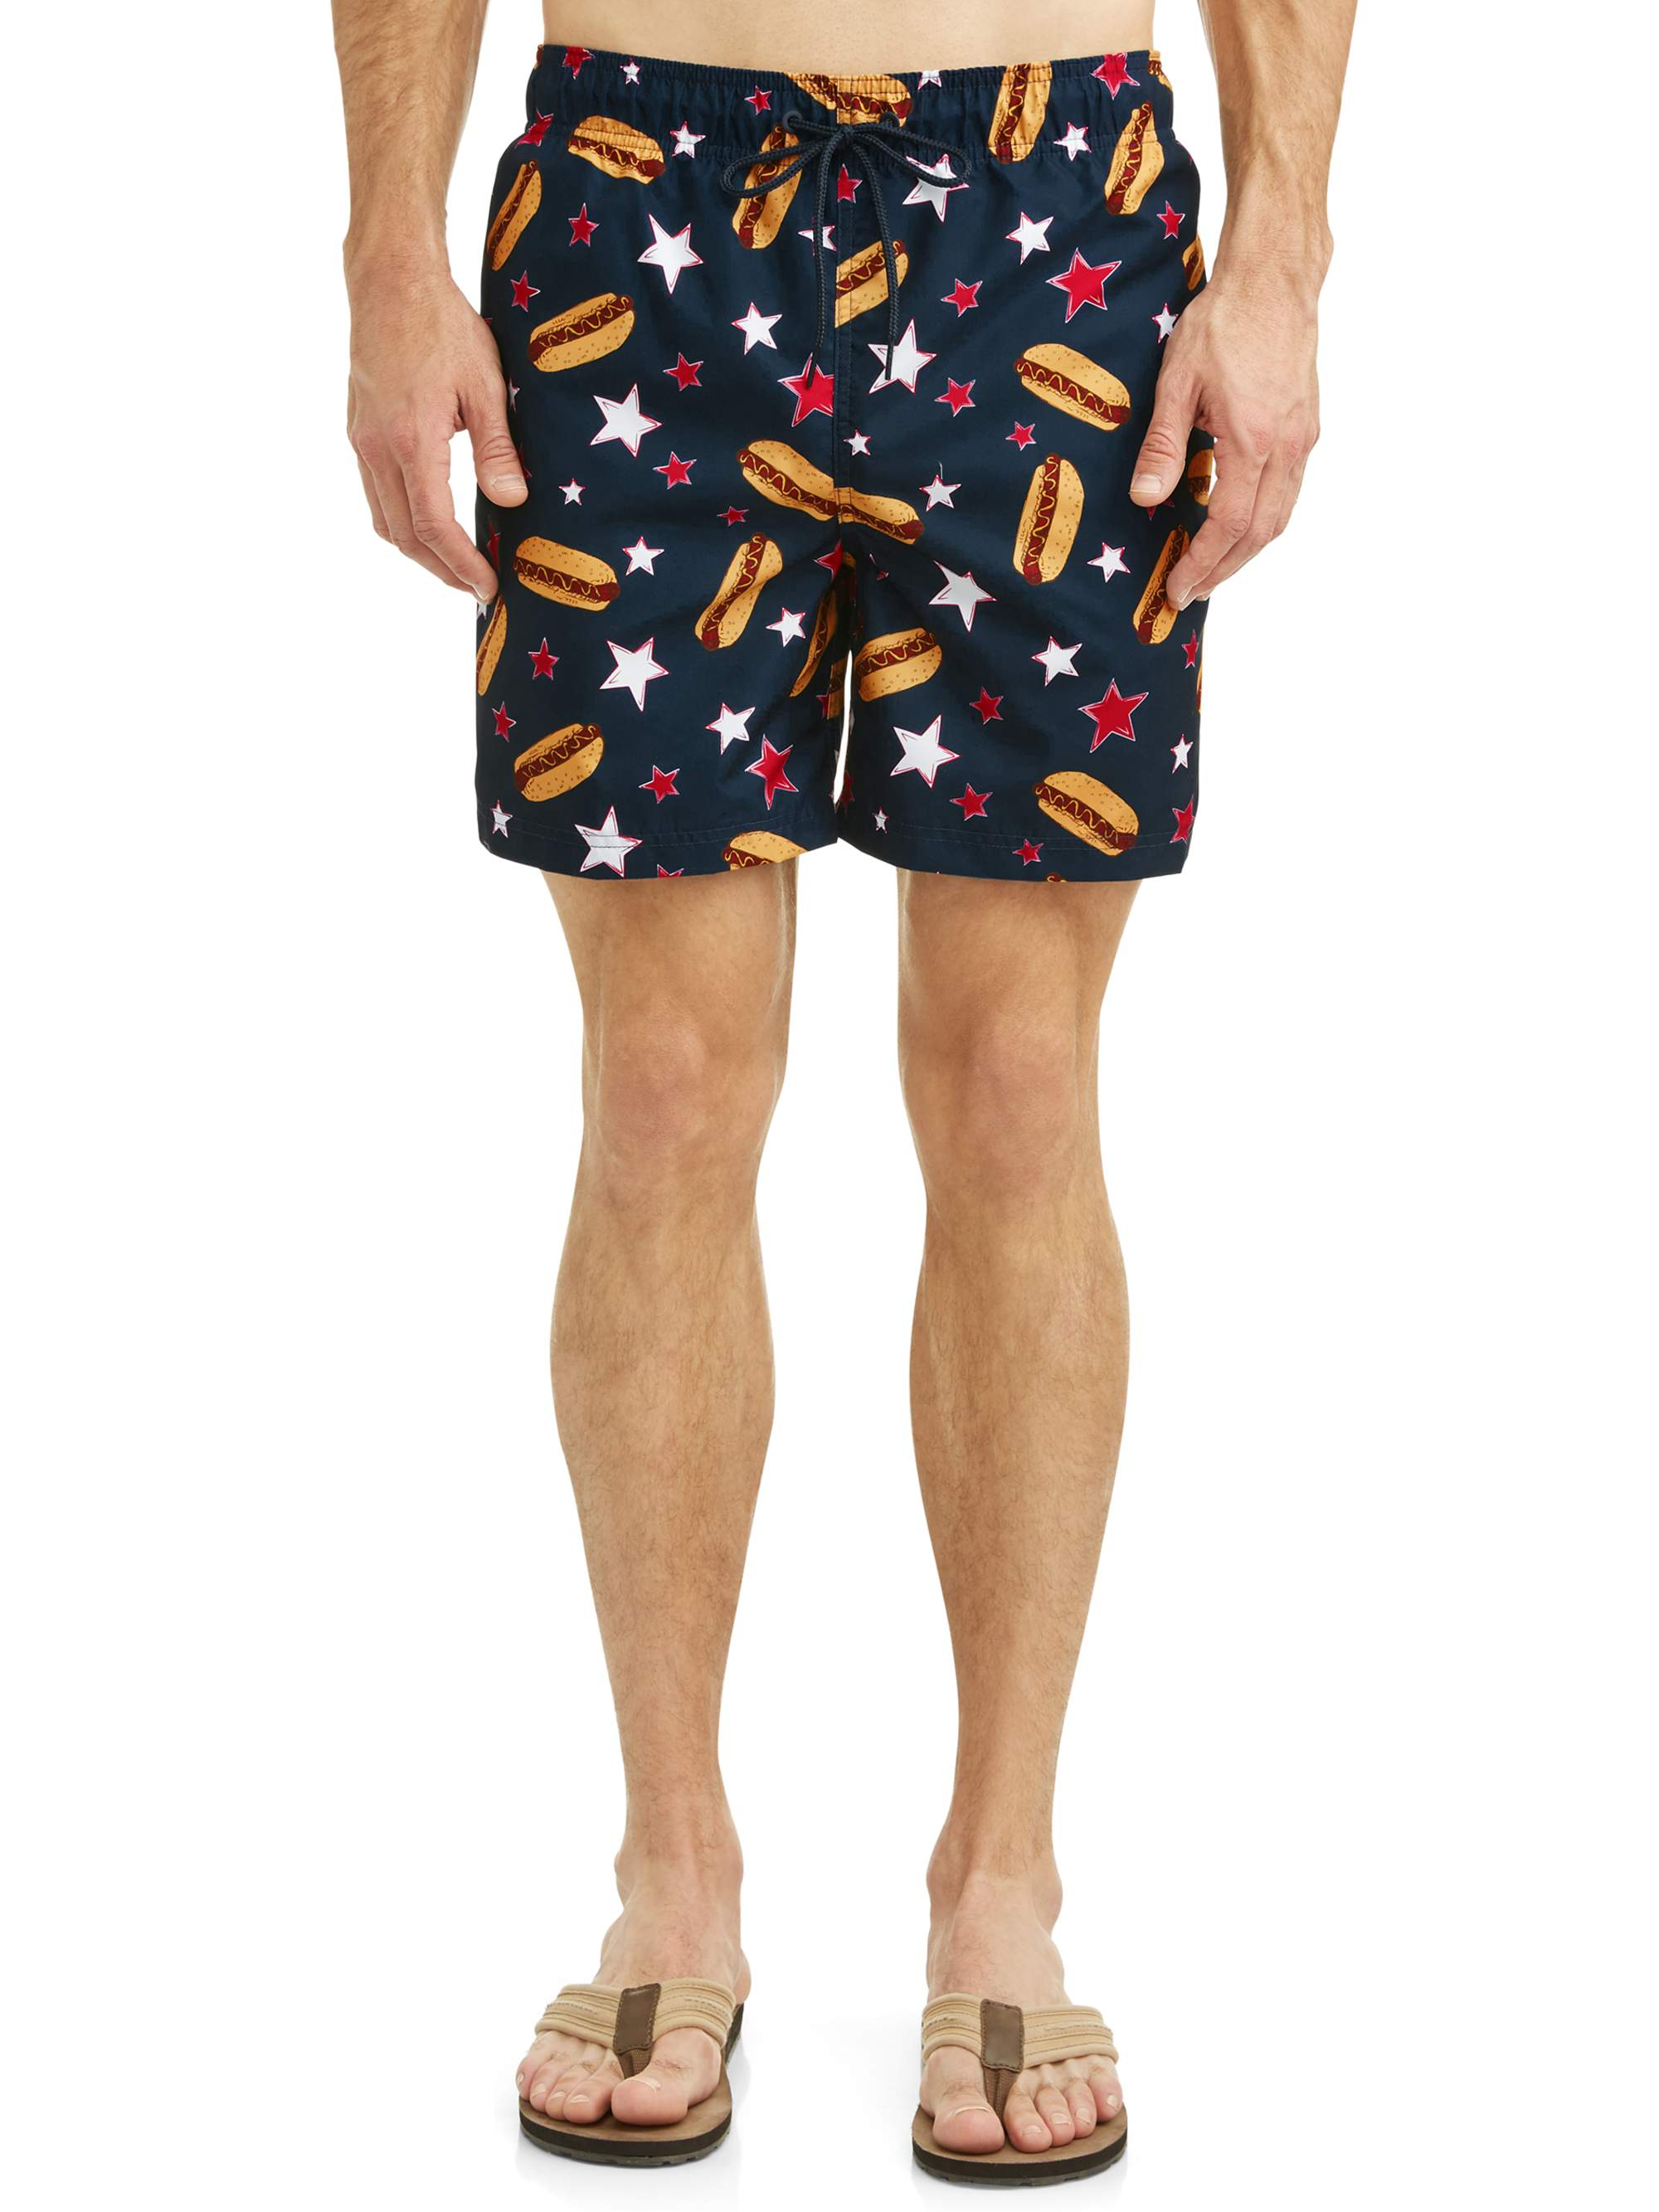 Men's Hotdog Swim Short, up to size 5XL